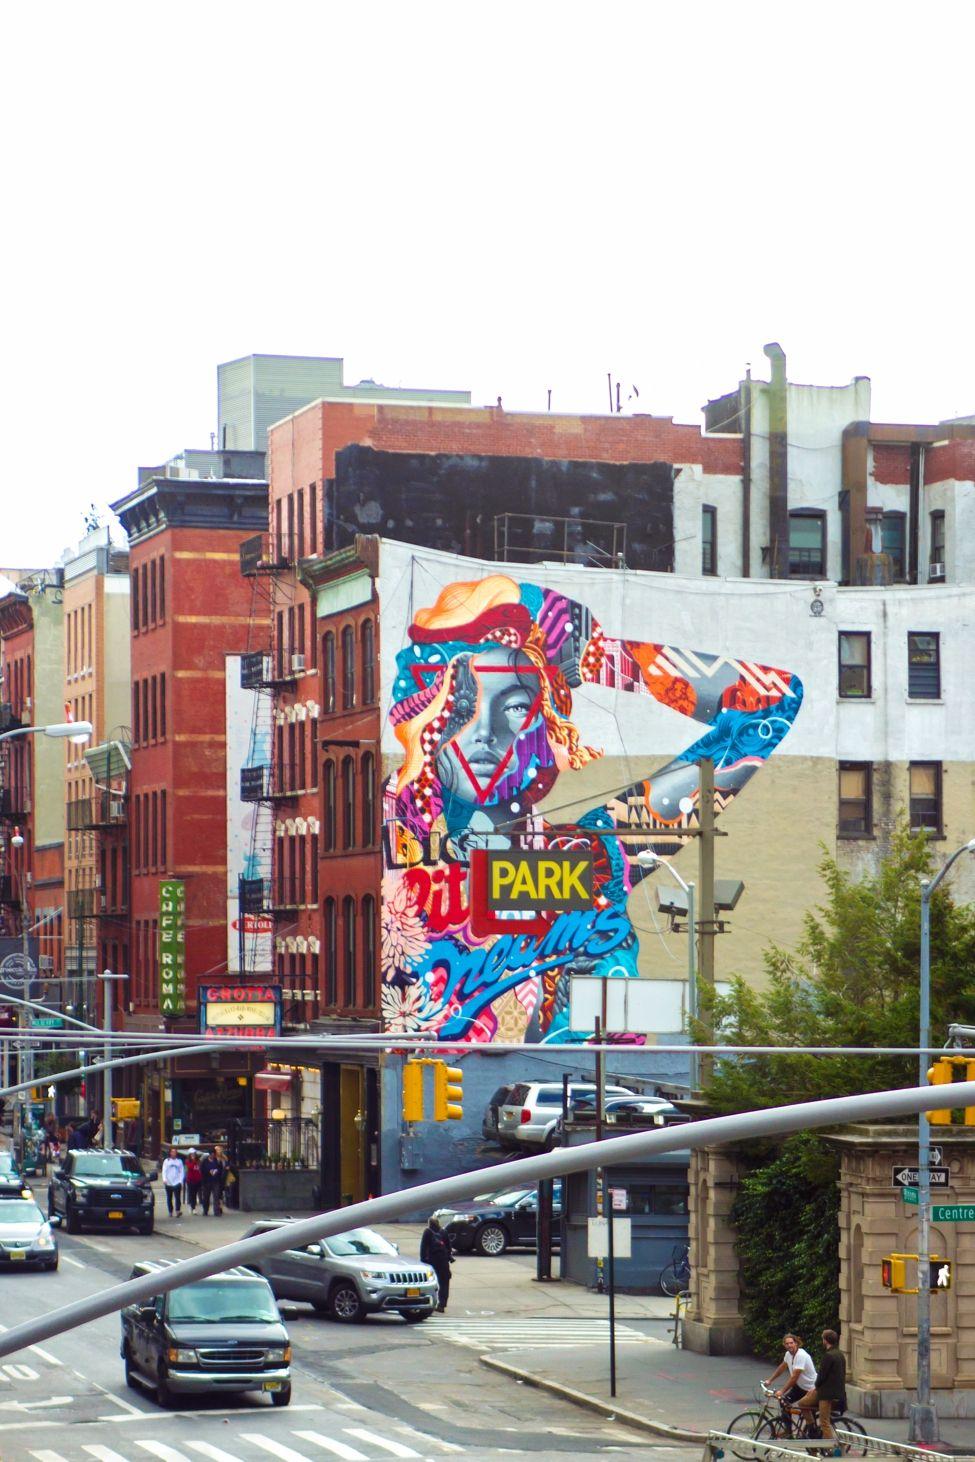 Foto Murales New York.Your Guide To Nyc S Best Murals In Soho Nolita Chinatown